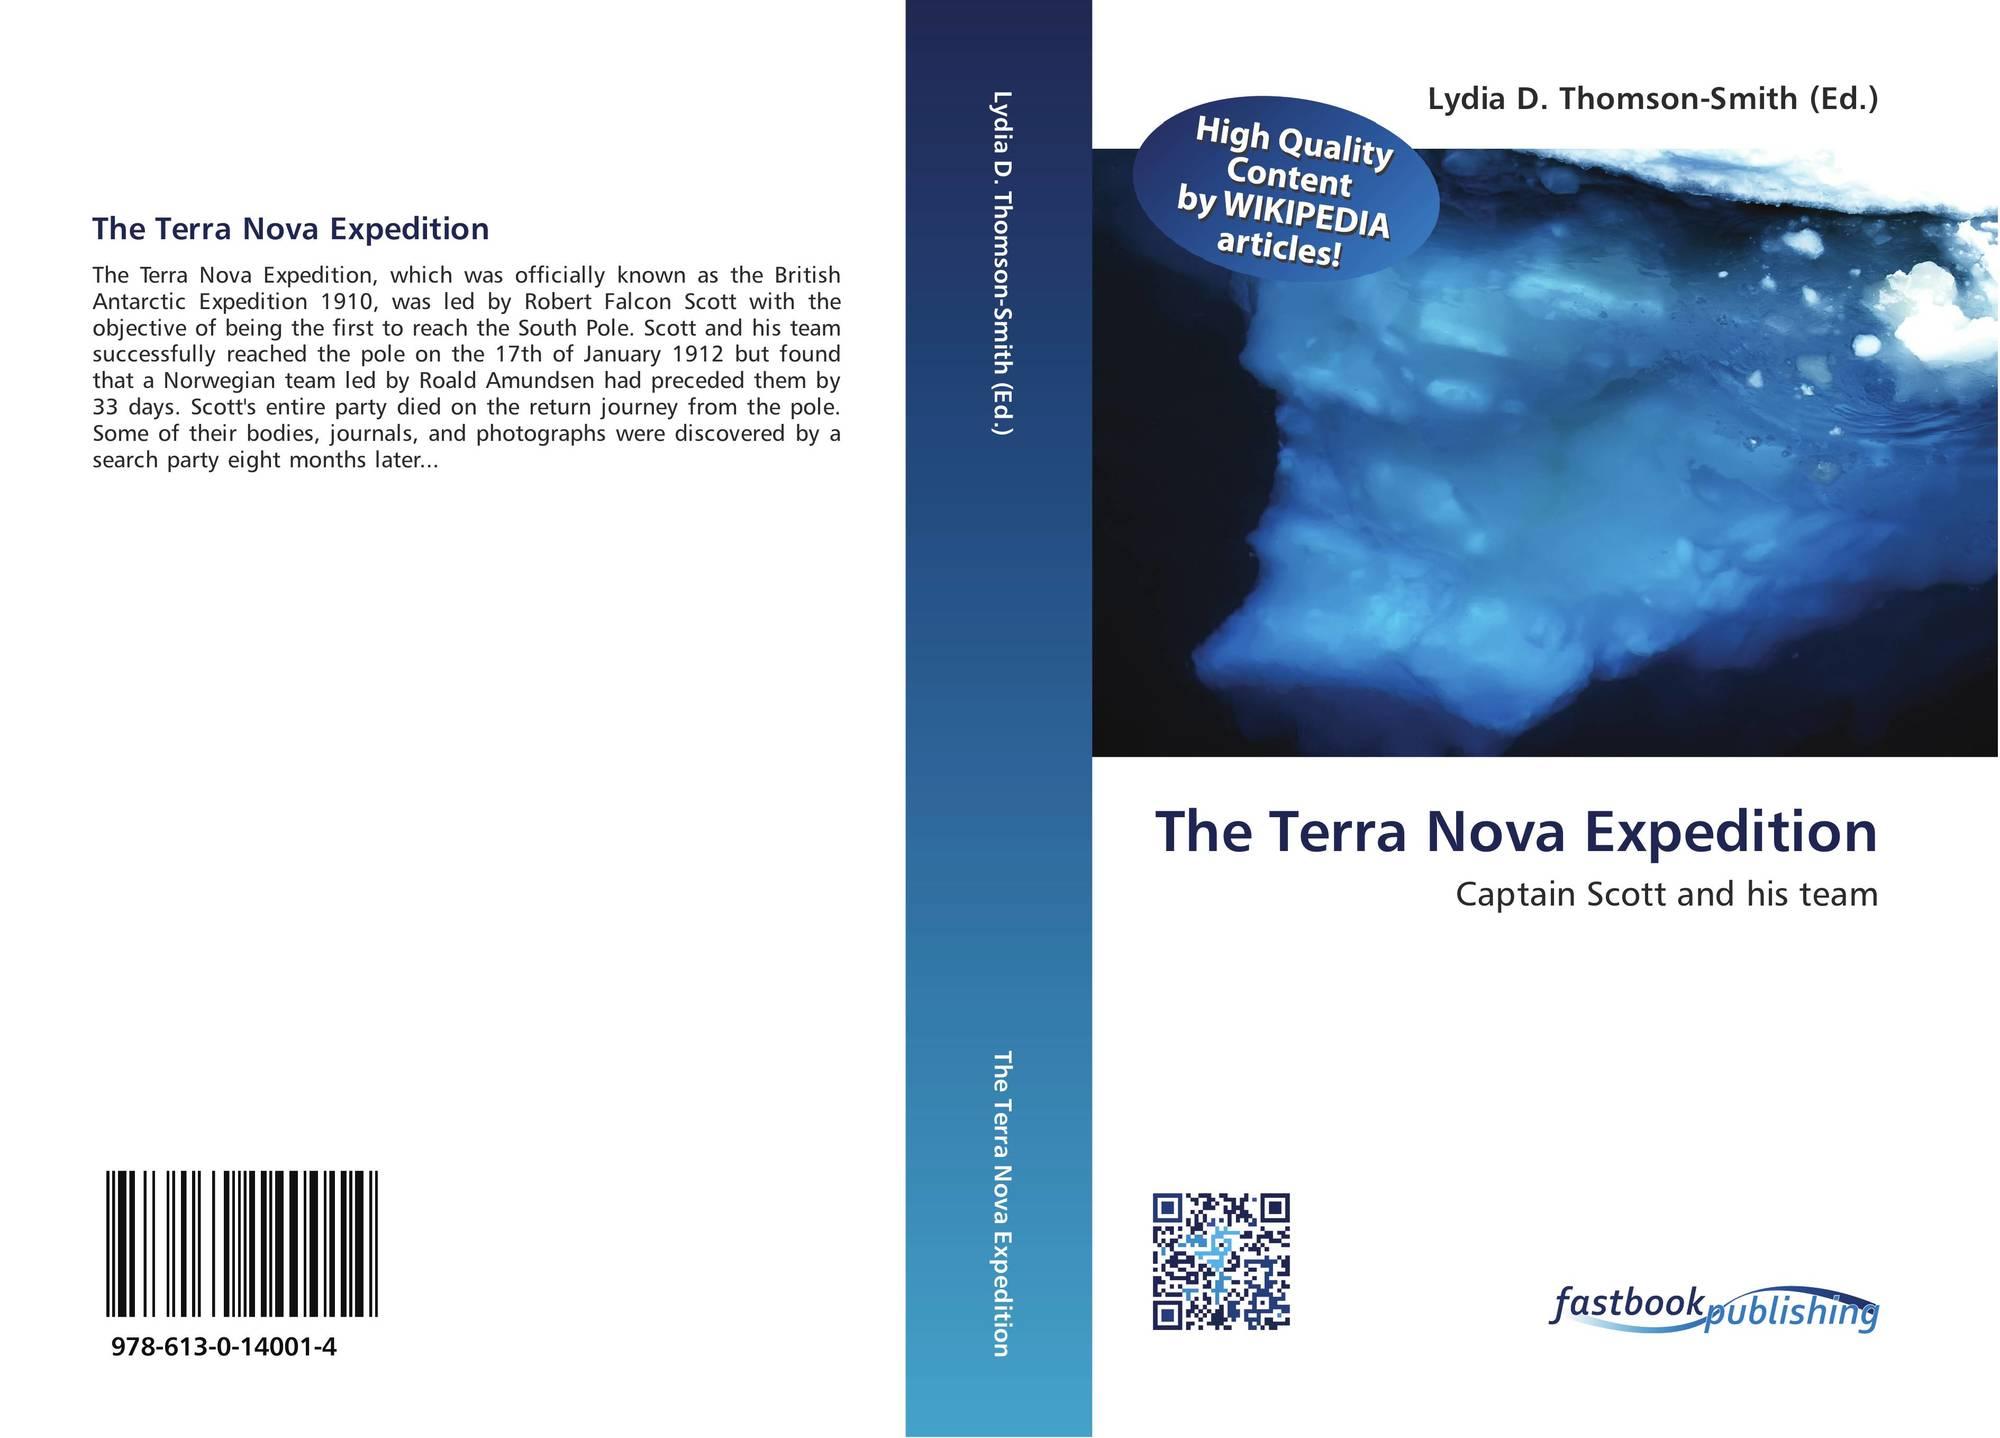 The Terra Nova Expedition, 978-613-0-14001-4, 6130140010